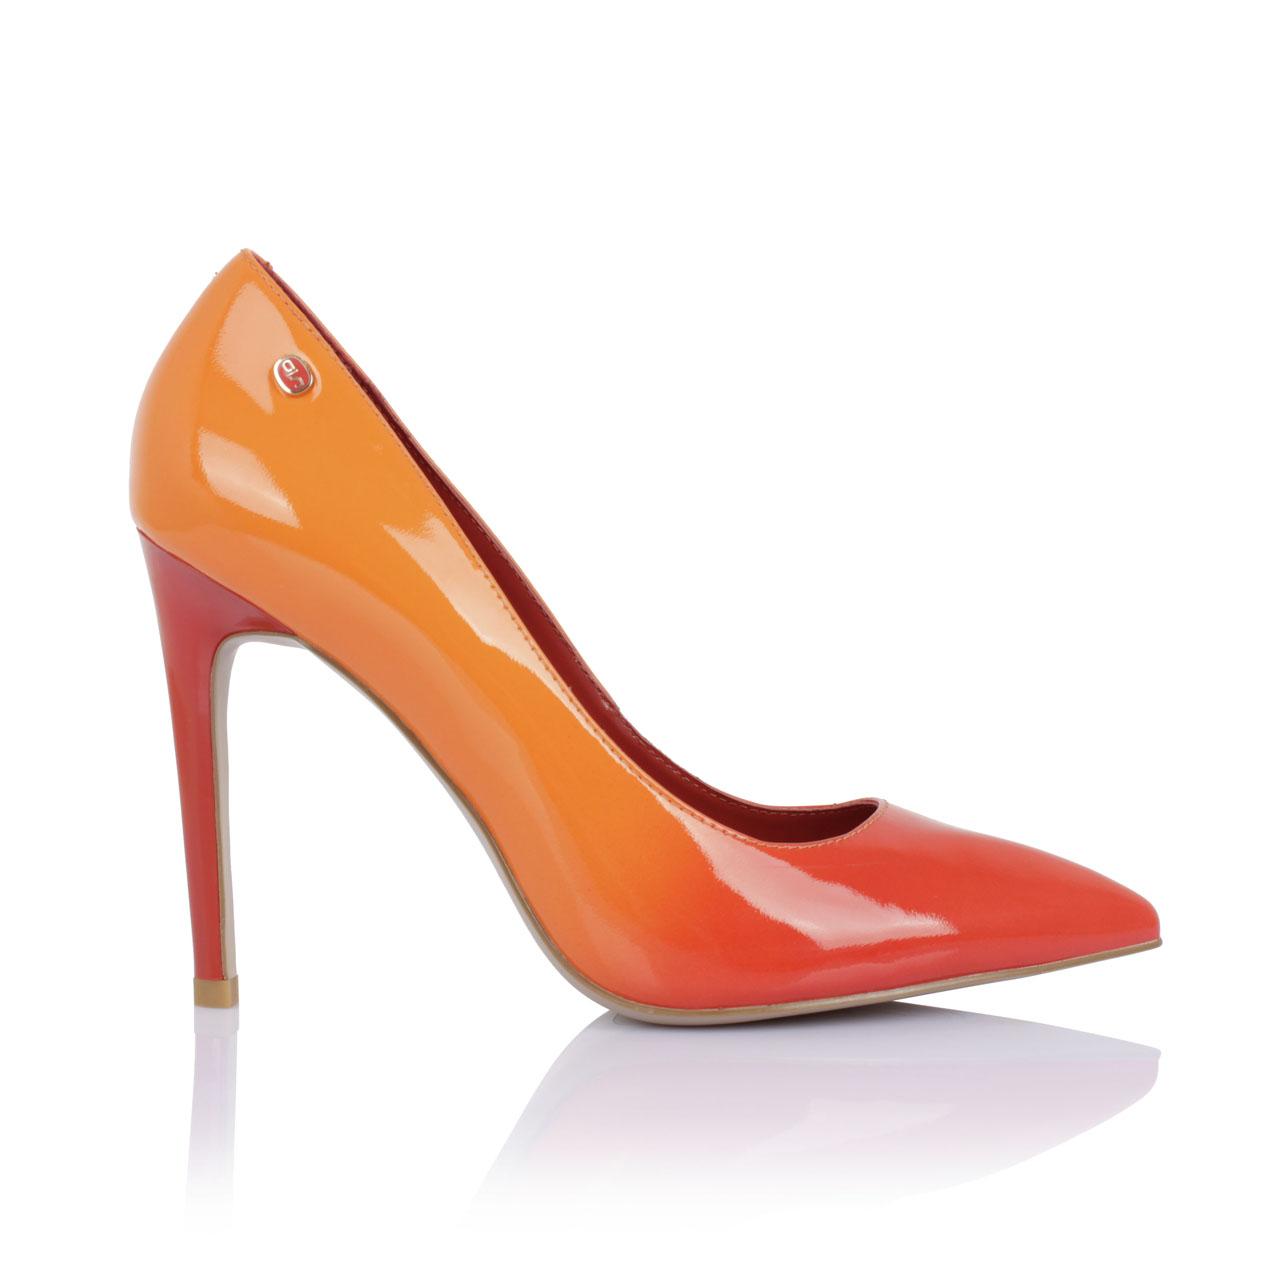 Вещь дня: туфли Antonio Biaggi для любого сценария встречи Нового года-320x180